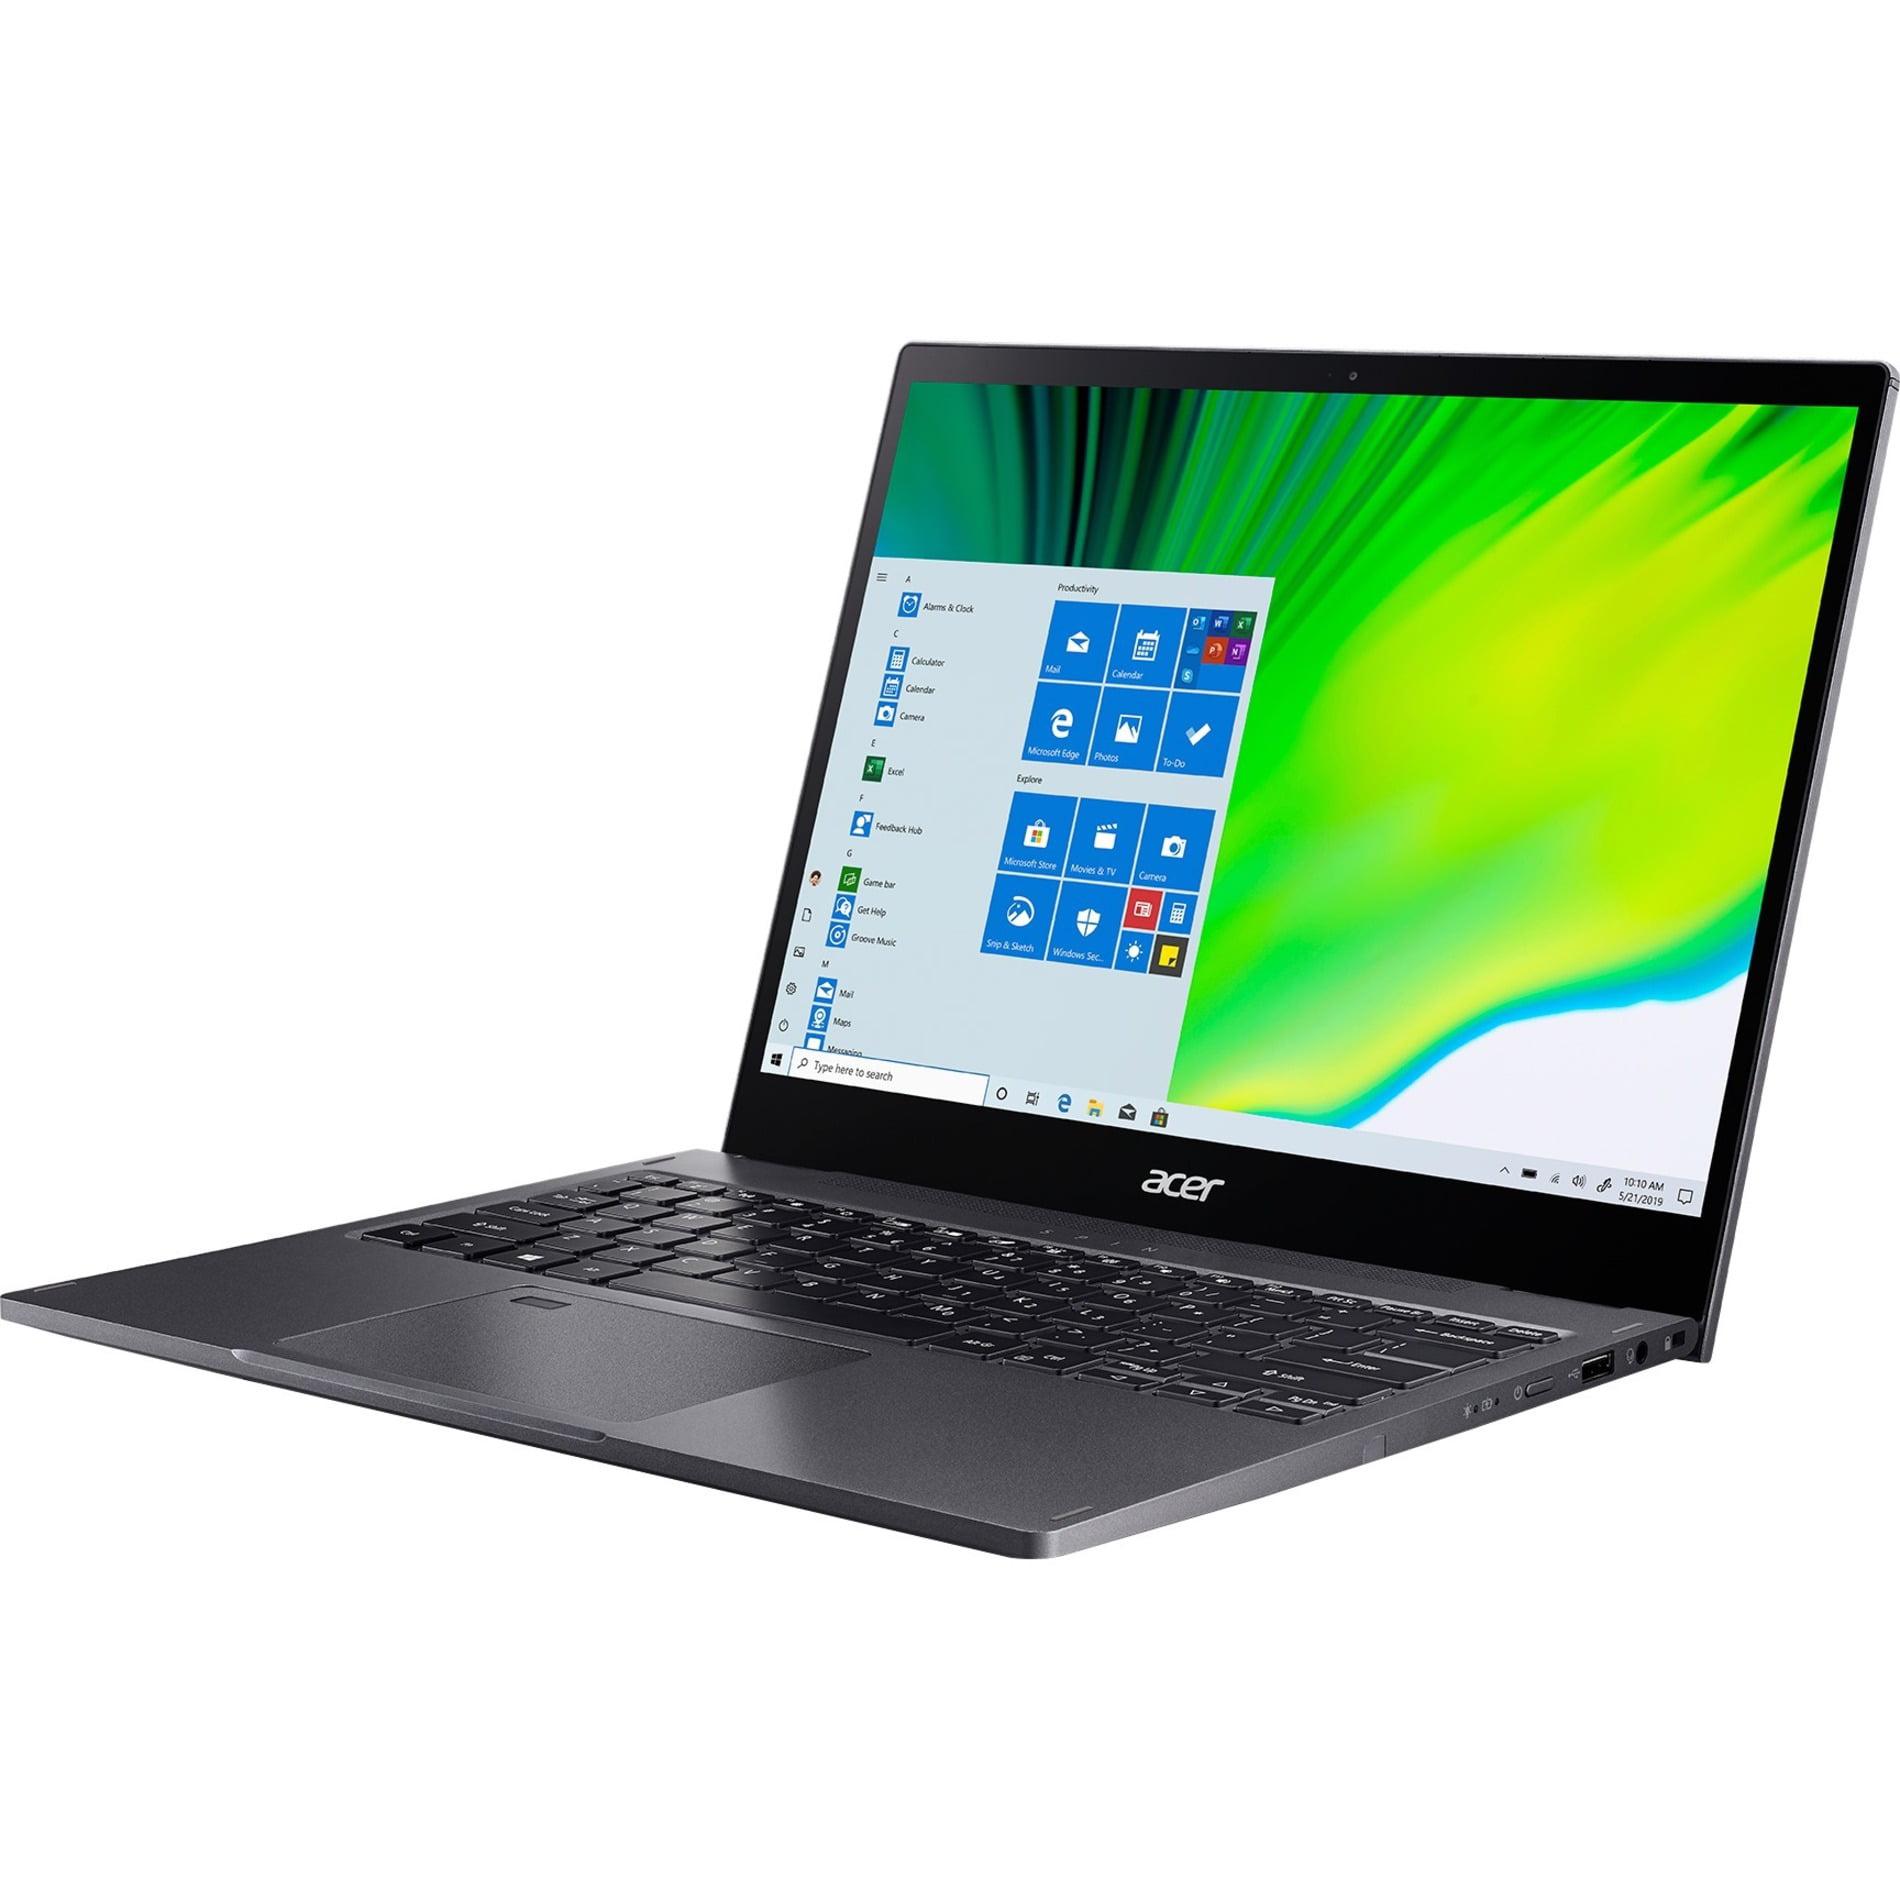 "Acer Spin 5 13.5"" Touchscreen 2-in-1 Laptop, Intel Core i7 i7-1065G7, 16GB RAM, 512GB SSD, Windows 10 Pro, Steel Gray, SP513-54N-70PU"